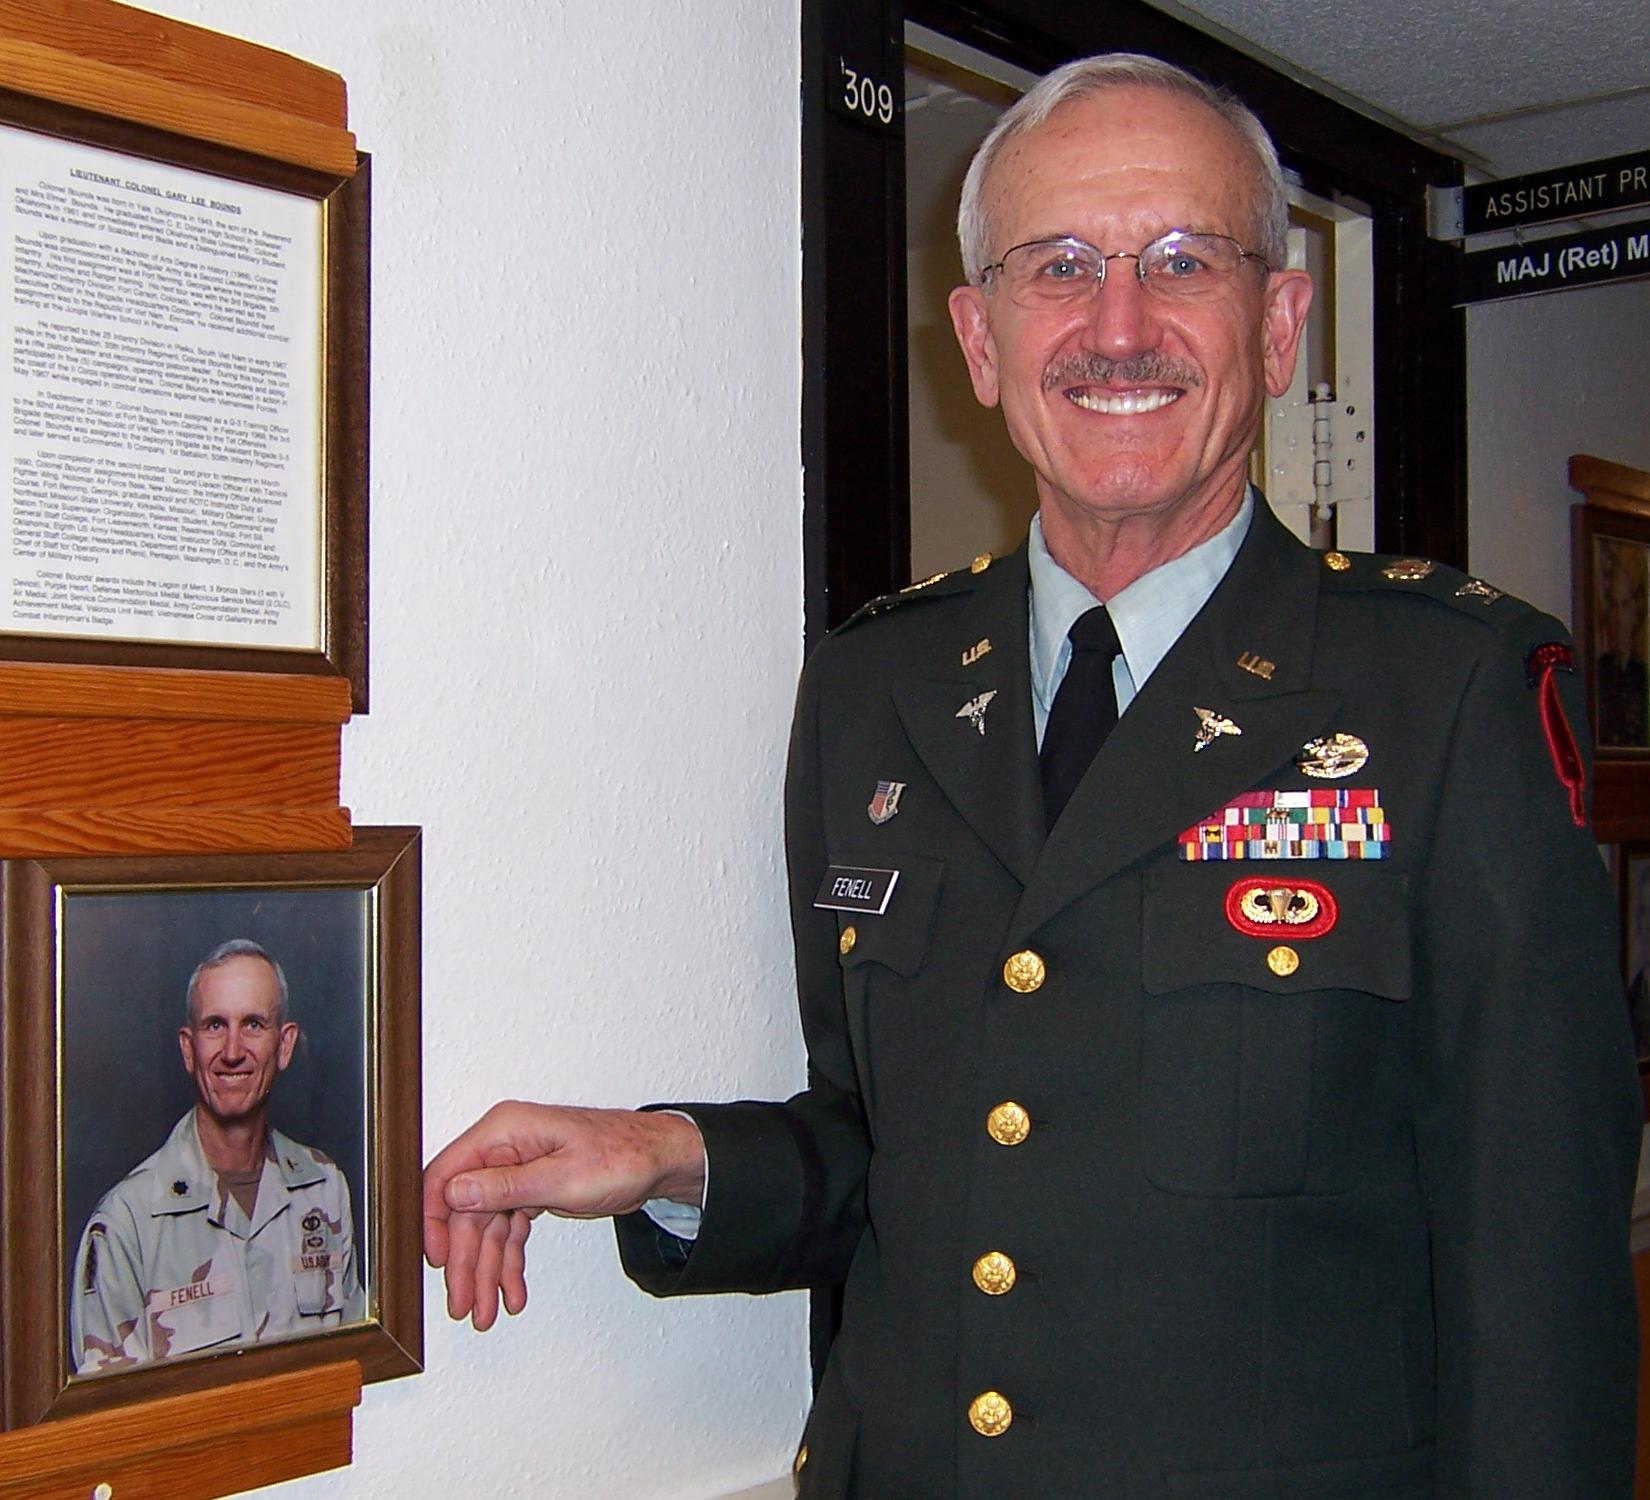 Portrait of David Fenell